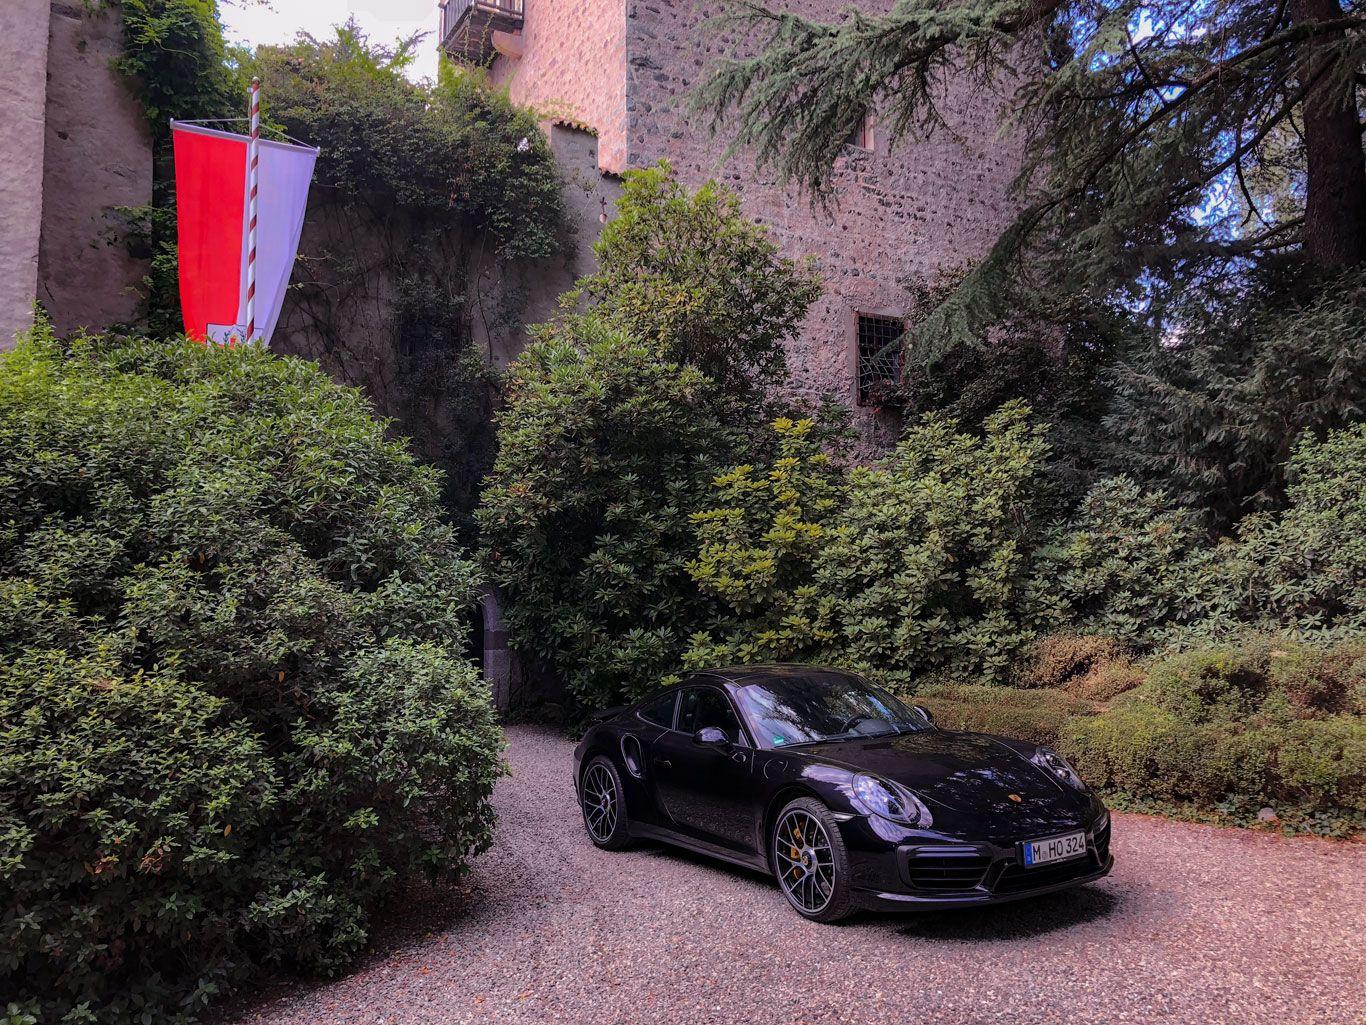 Porsche 911 Turbo S vor Schloss in Südtirol